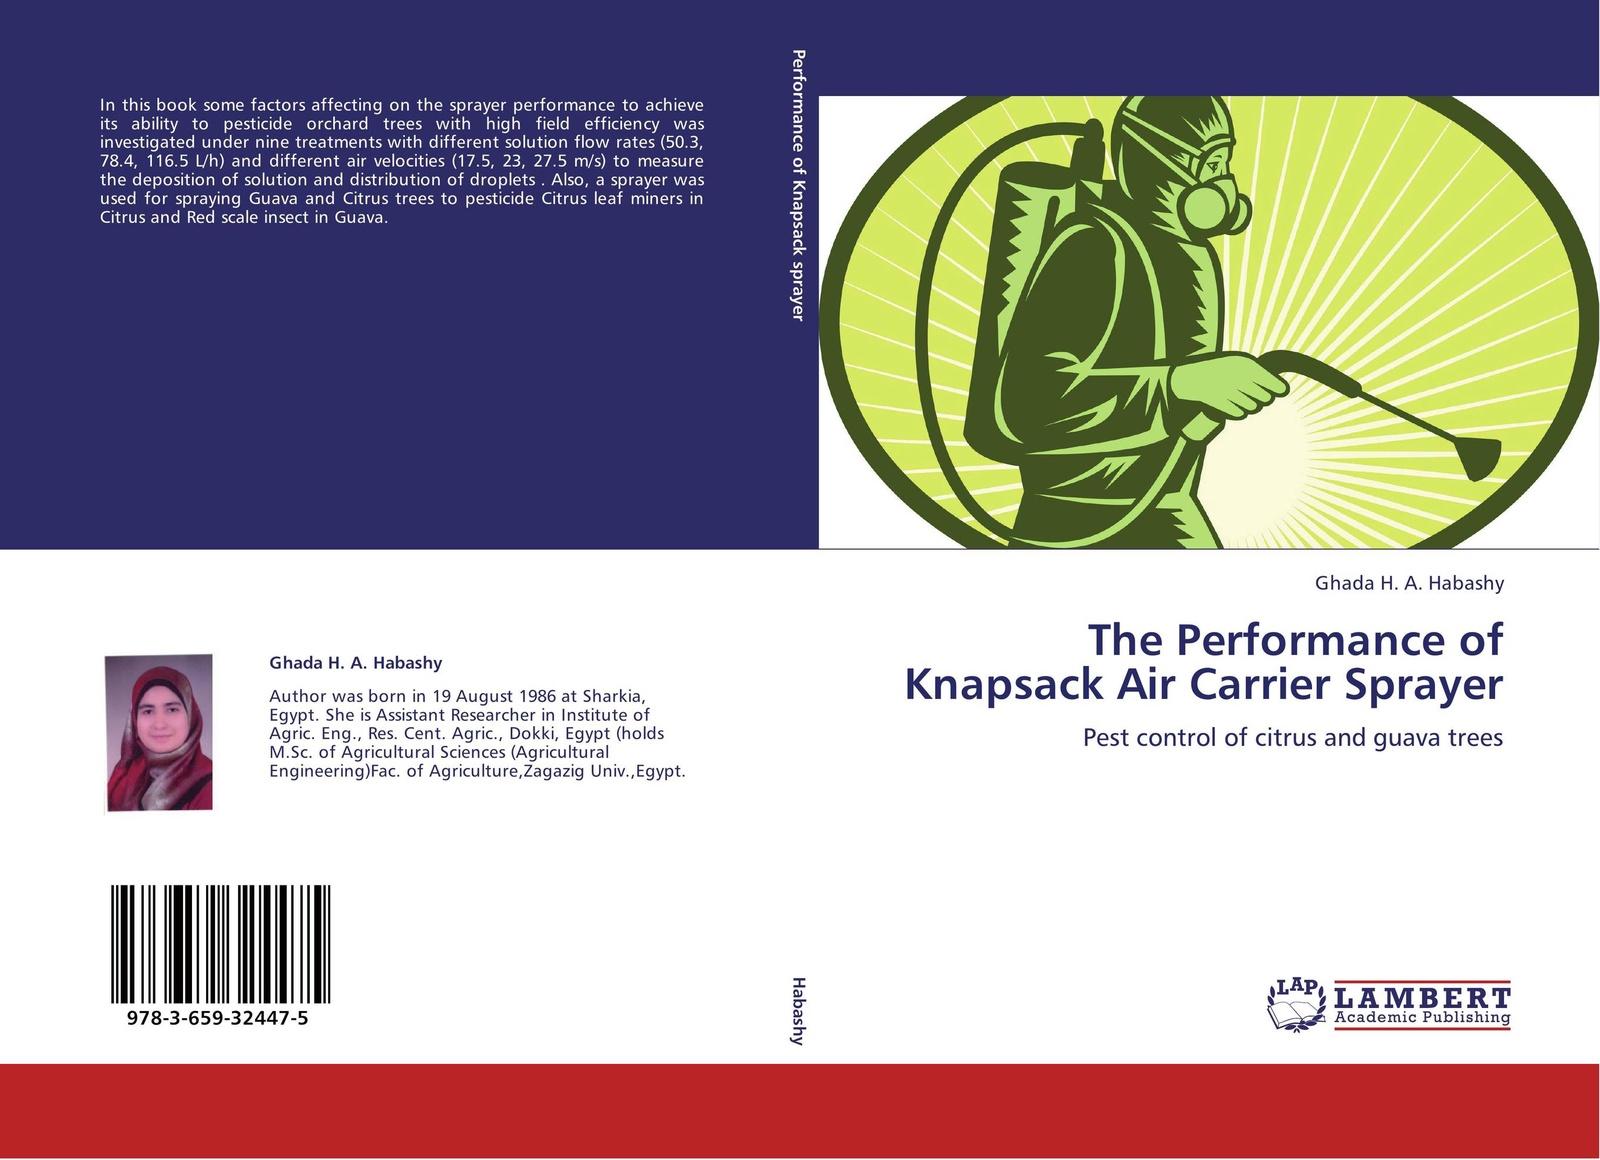 Ghada H. A. Habashy The Performance of Knapsack Air Carrier Sprayer недорго, оригинальная цена